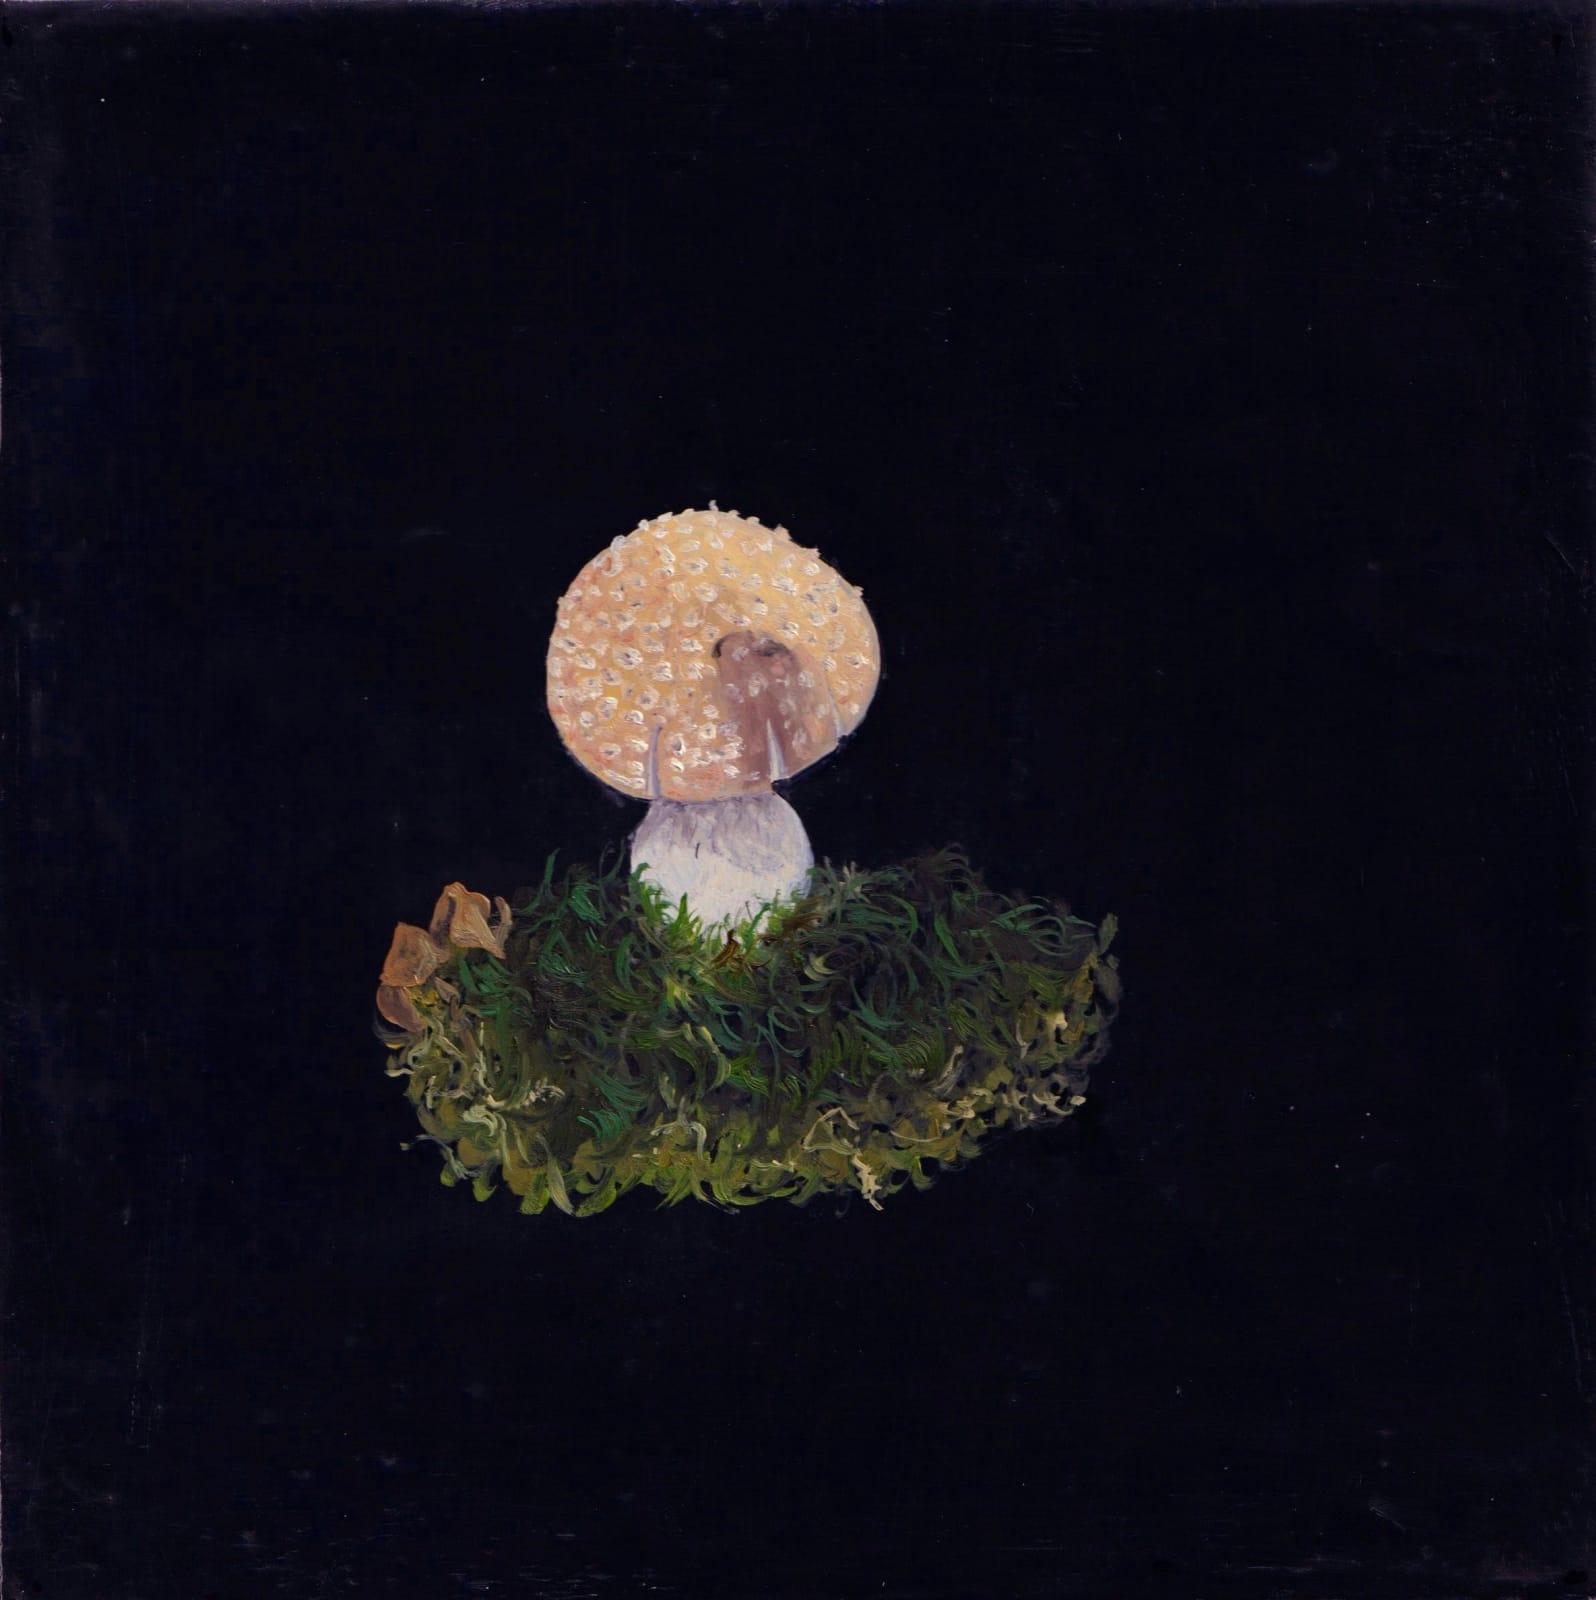 Melanie Miller, Fungi I, 2020